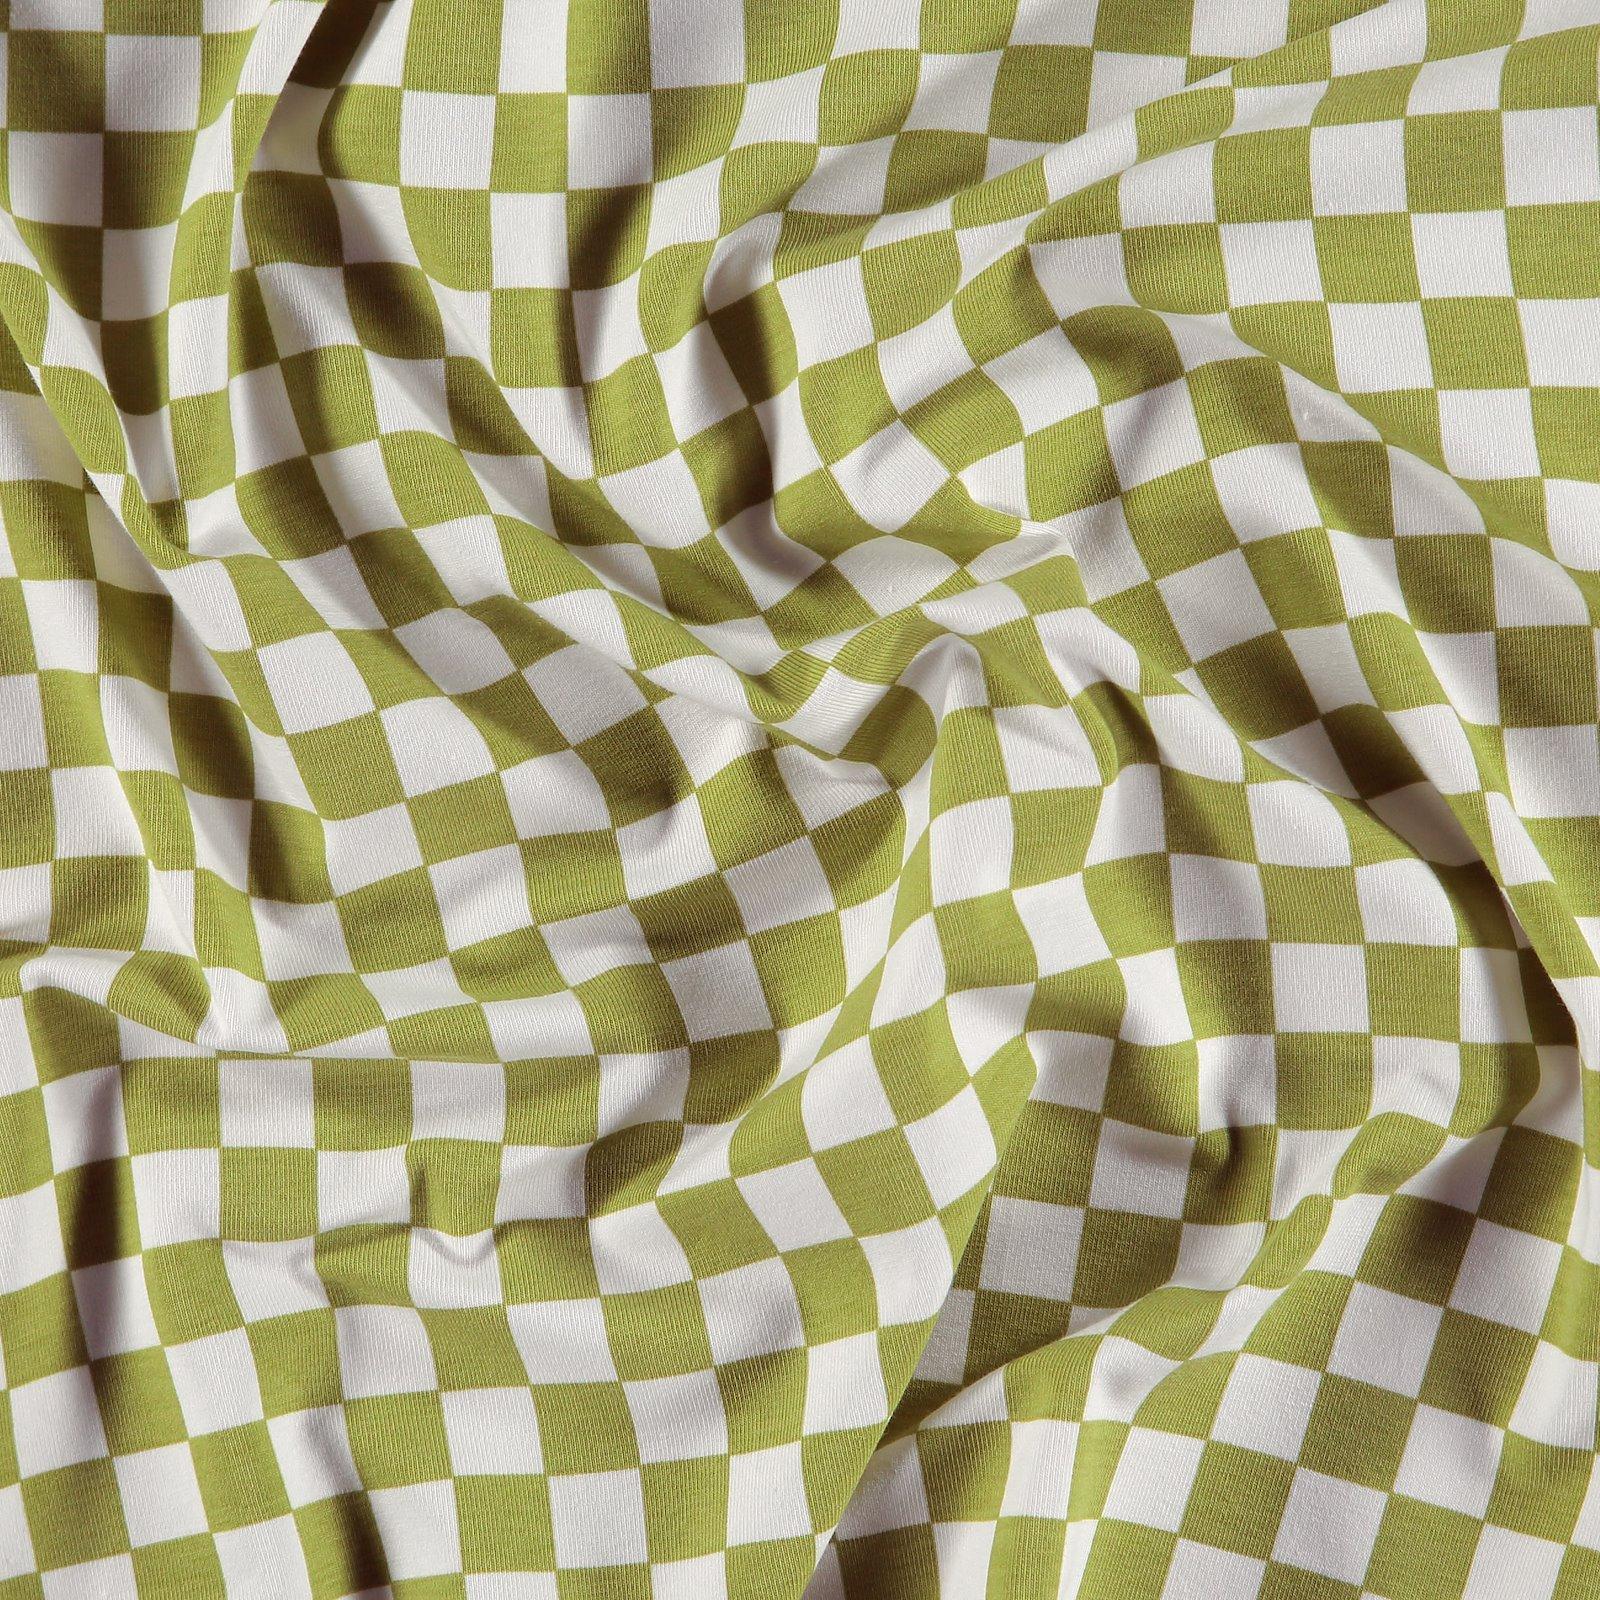 Organic str jersey w lime/offwhite check